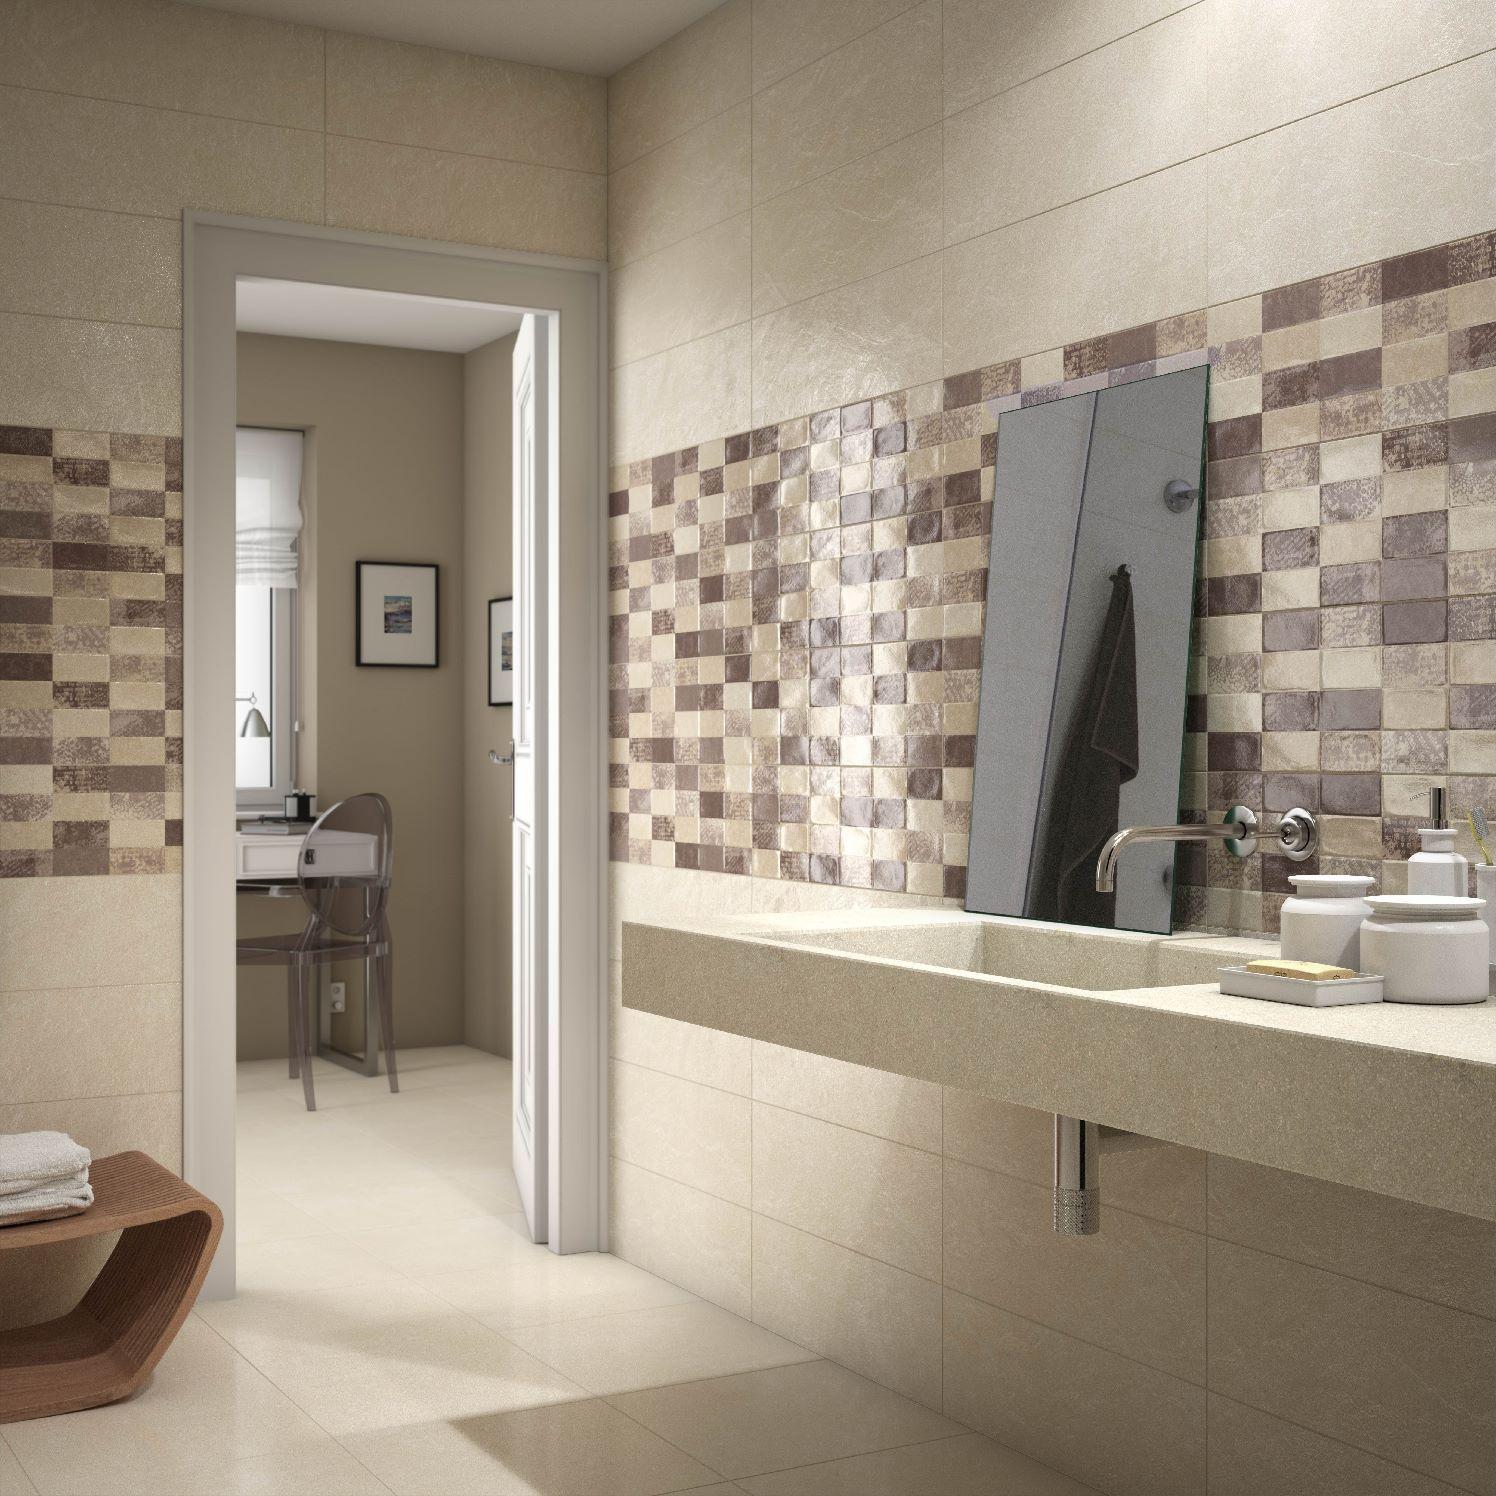 Pavimentos revestimientos azulejos ba o y cocina ba o - Pavimento para banos ...